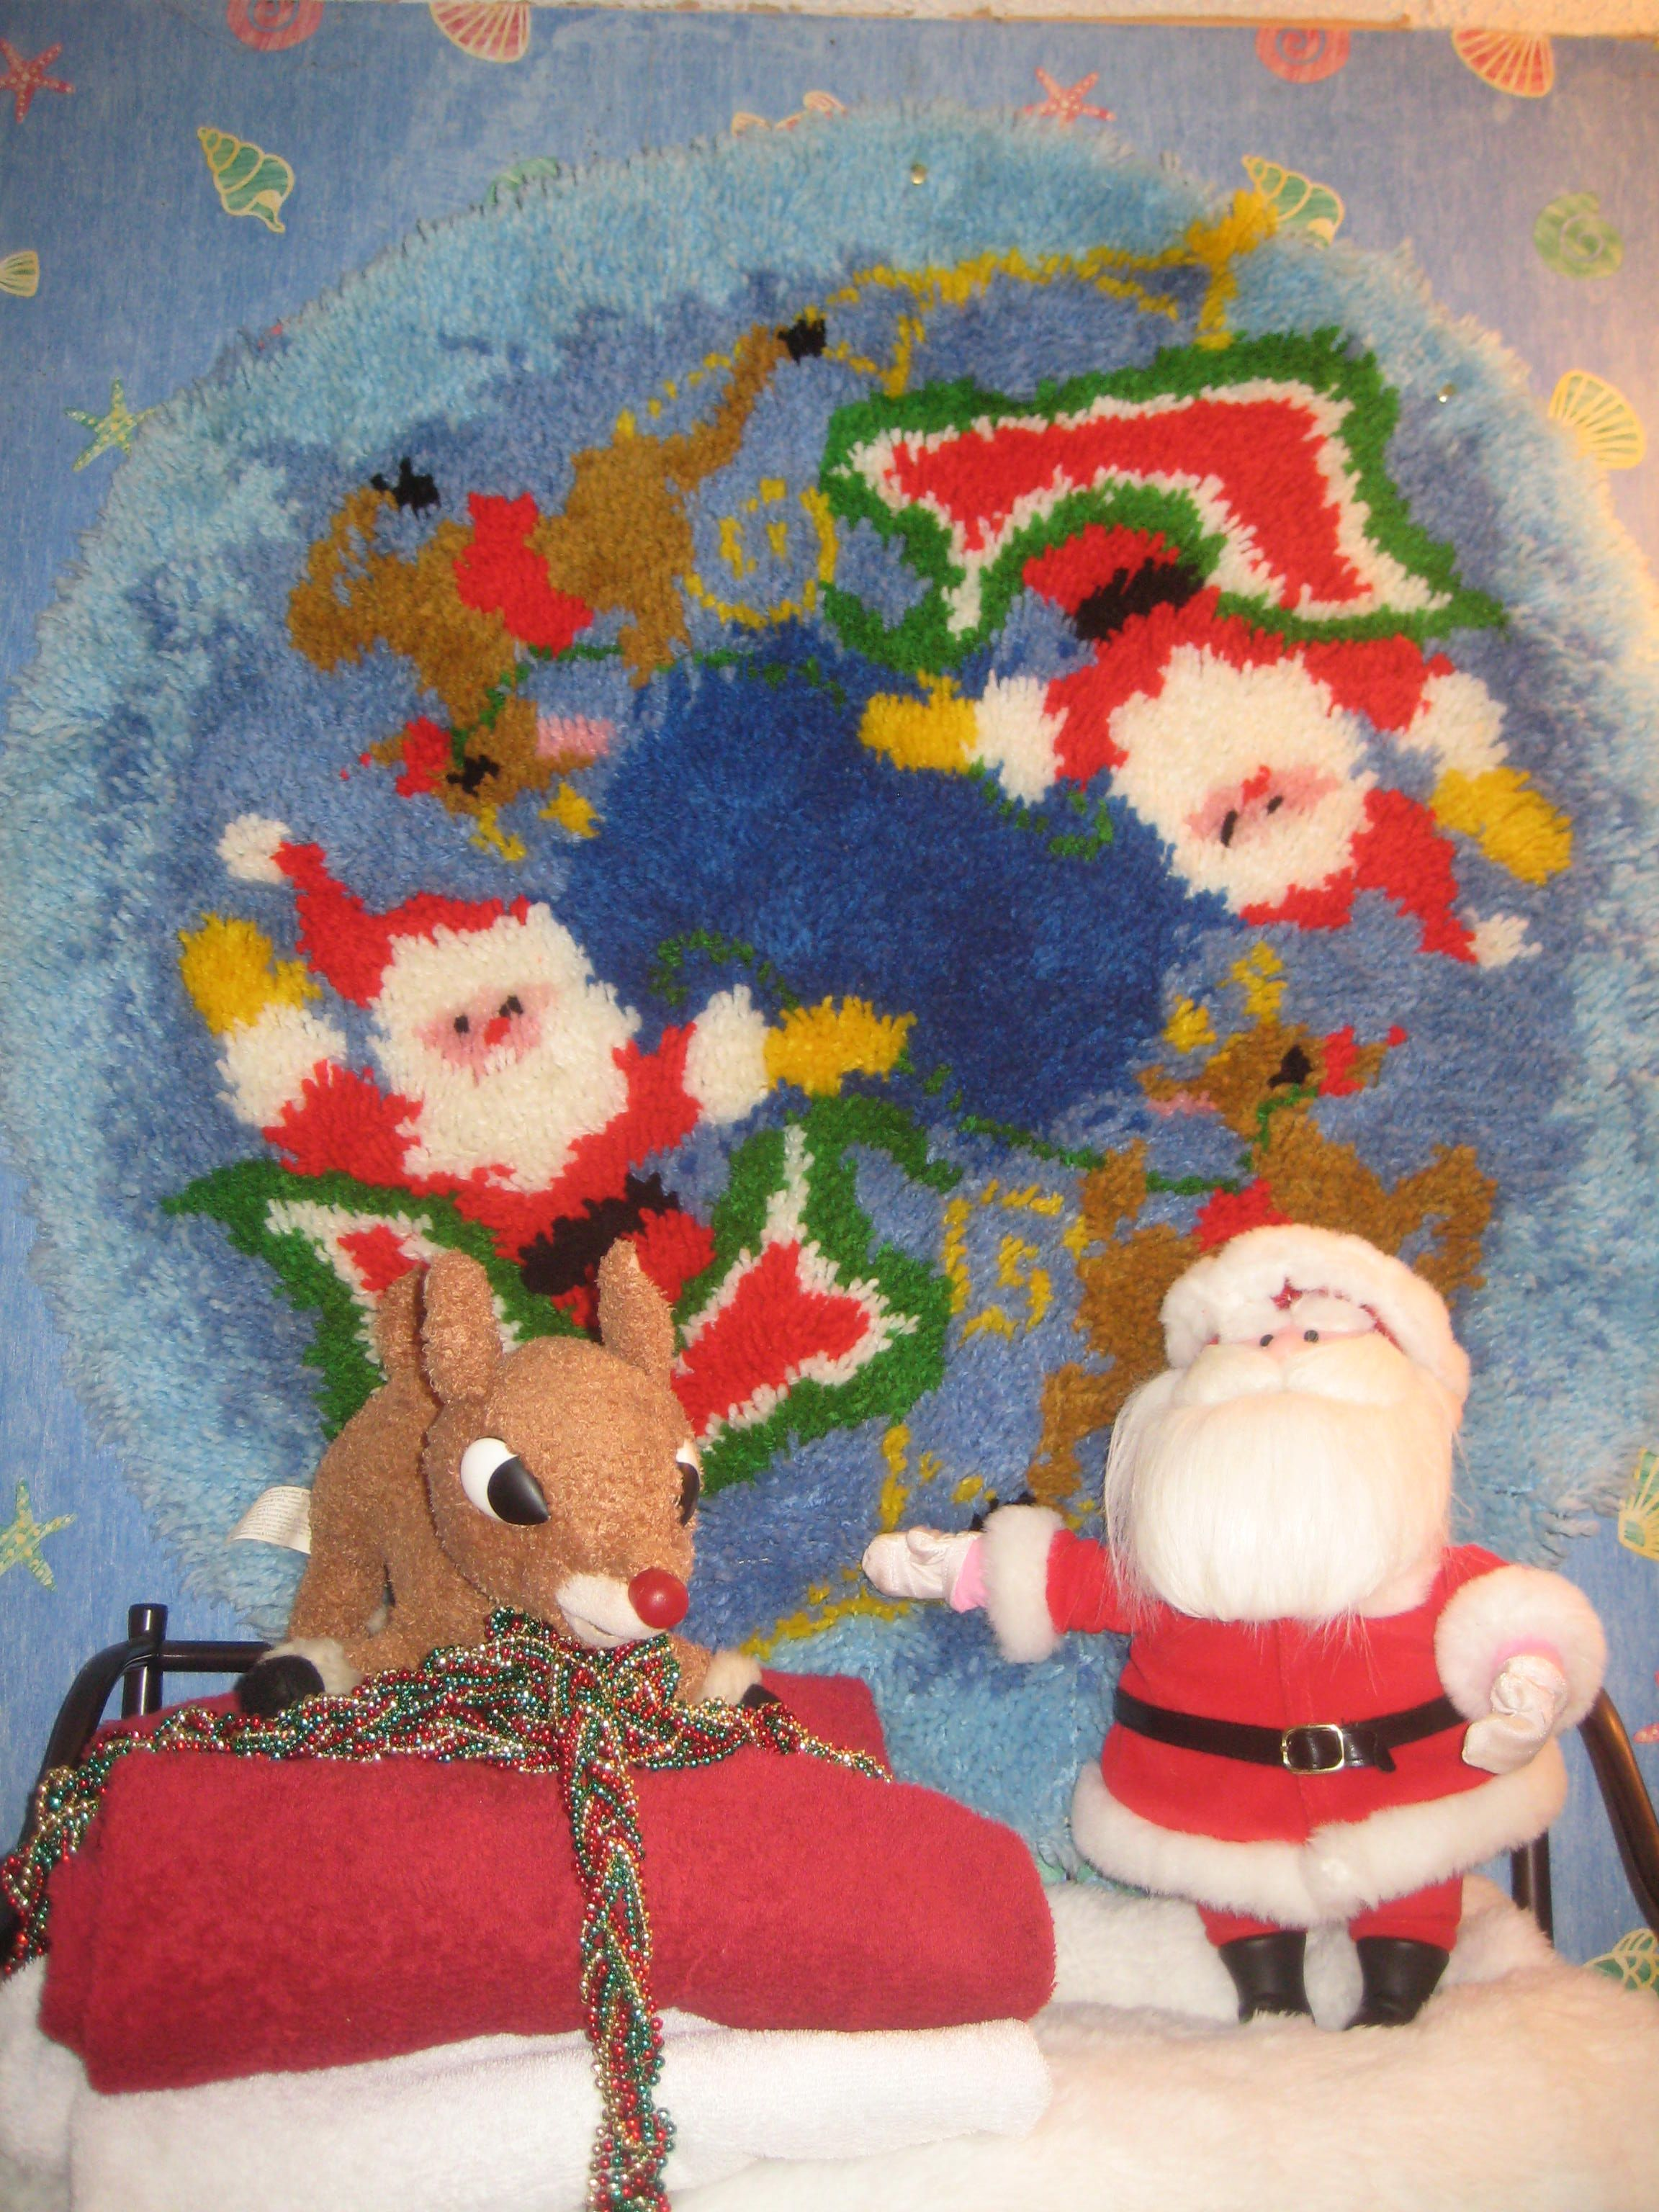 Kitschy Christmas goodness from my little boys bathroom shelf. :) <3 ...